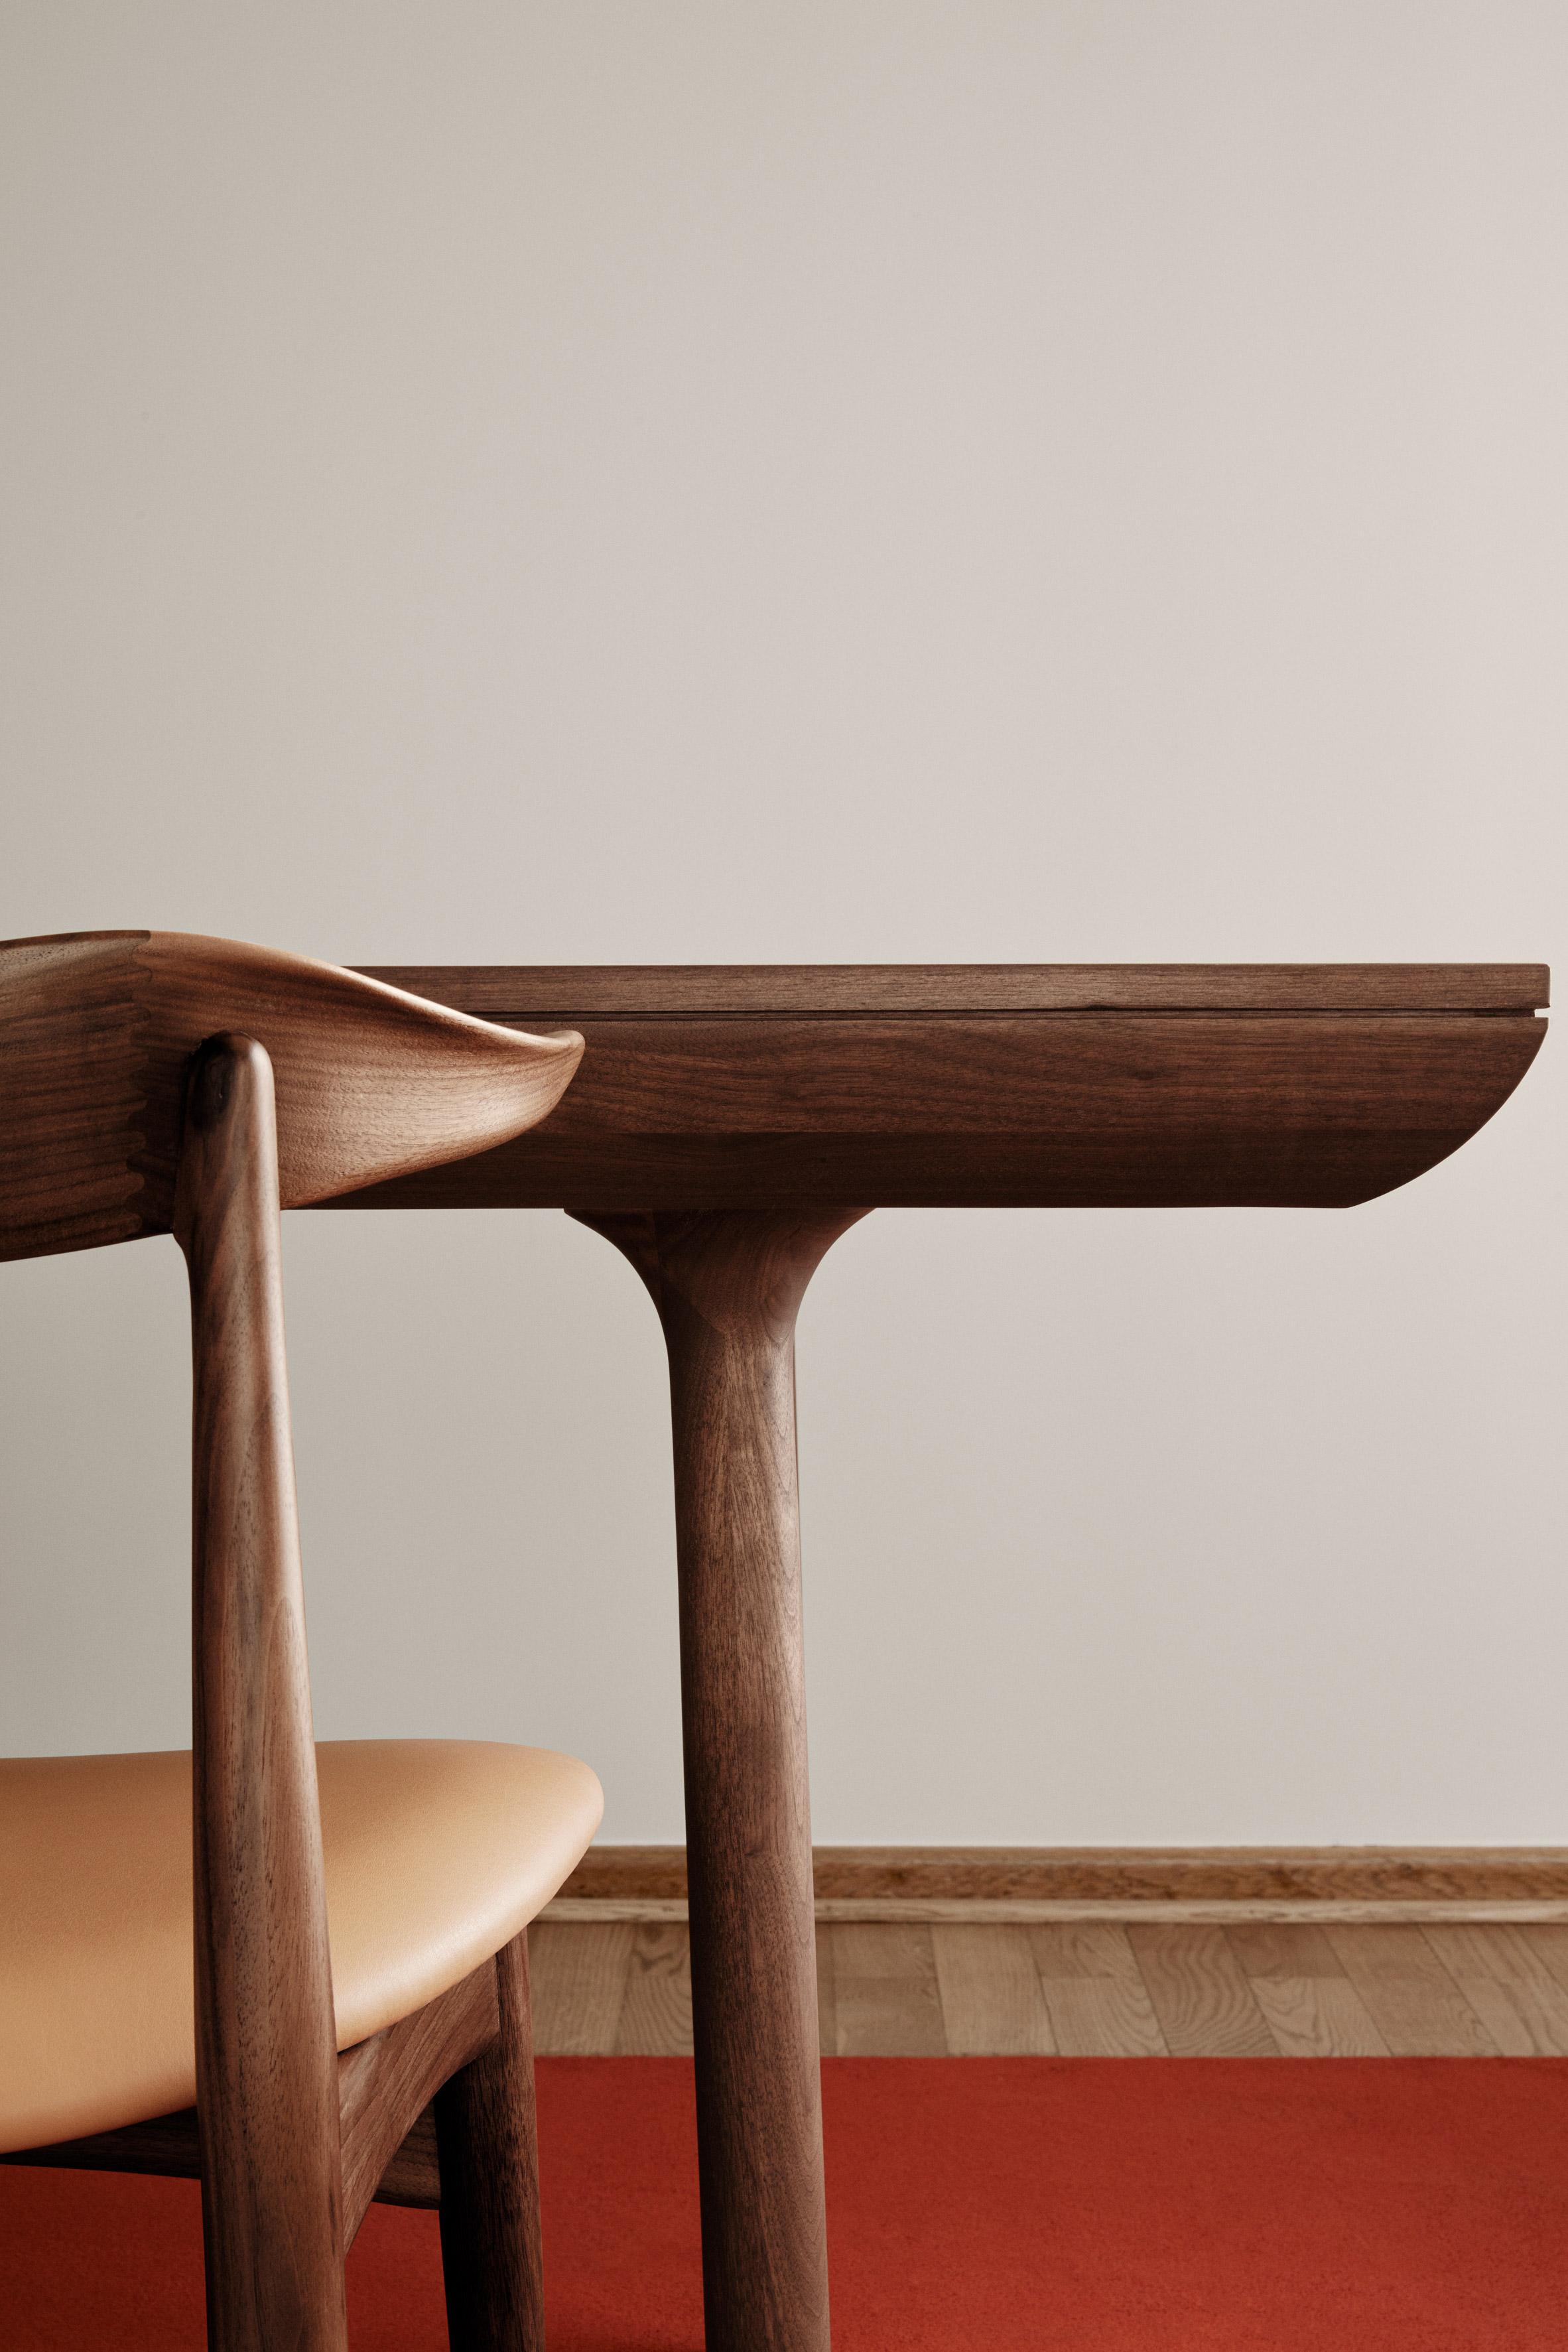 runa-isabel-ahm-aarm-nordic-design-furniture-danish_dezeen_2364_col_16.jpg